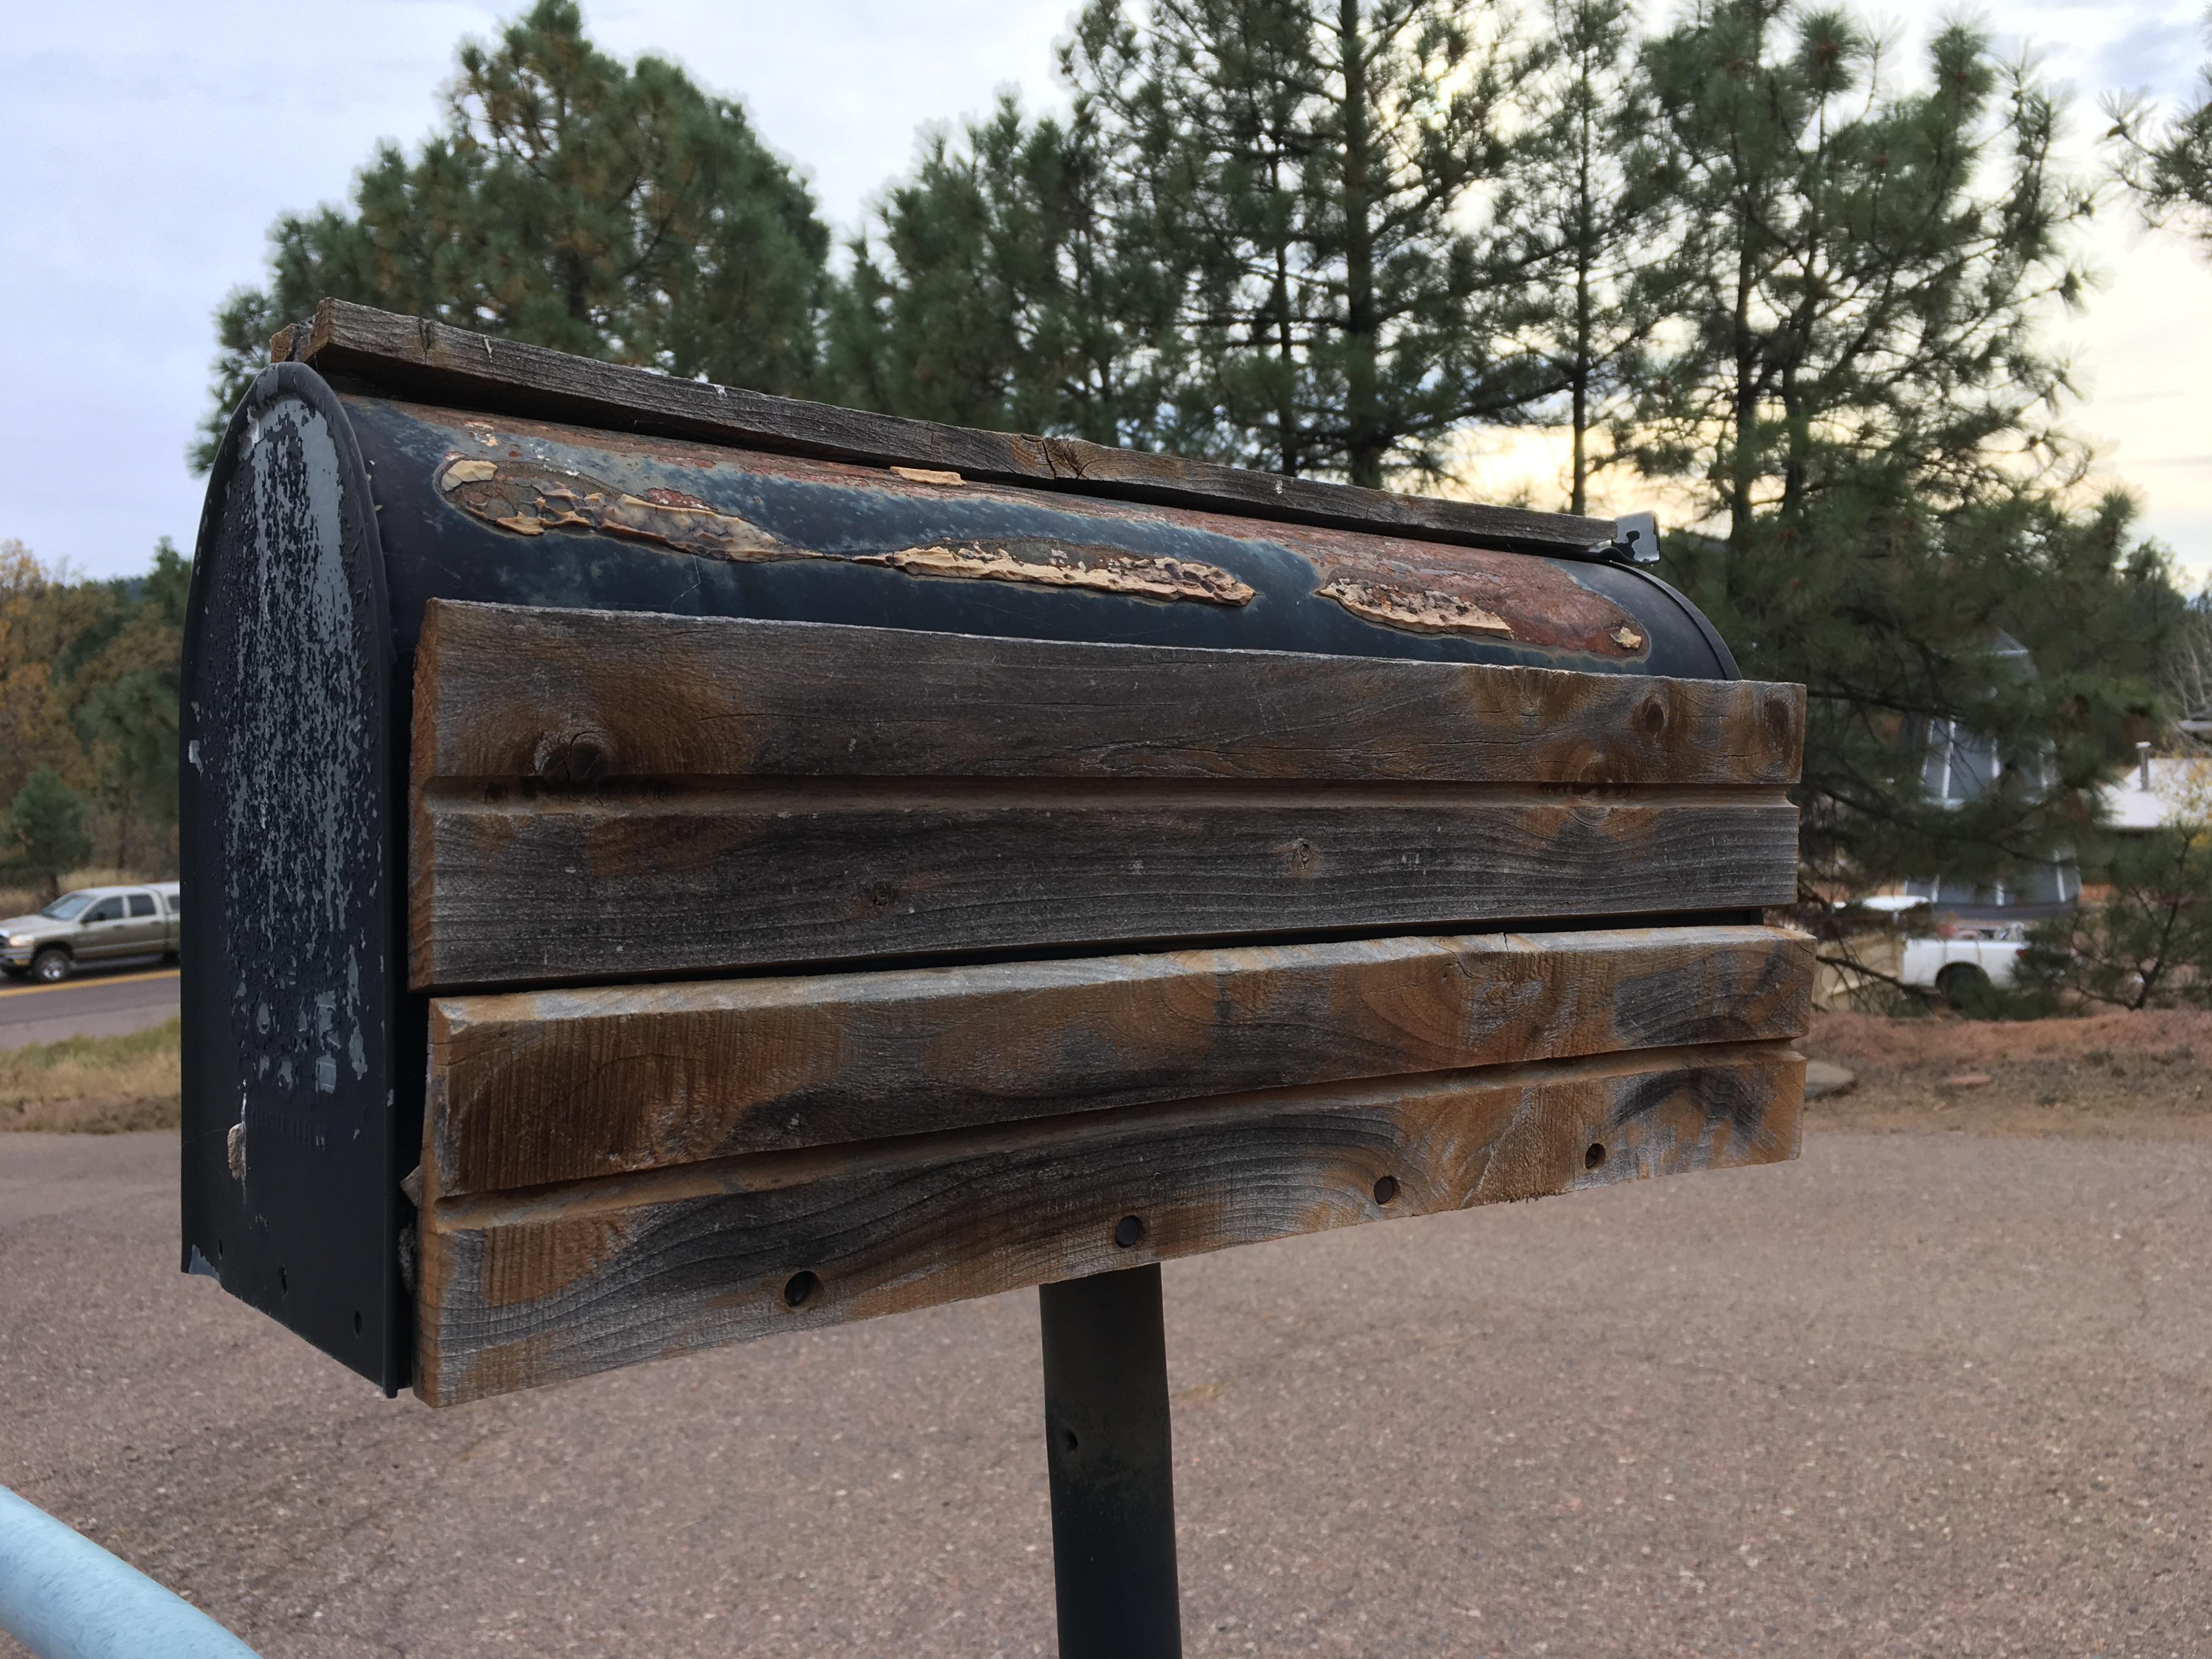 Wood Car Furniture : Free images wood bench car transport vehicle